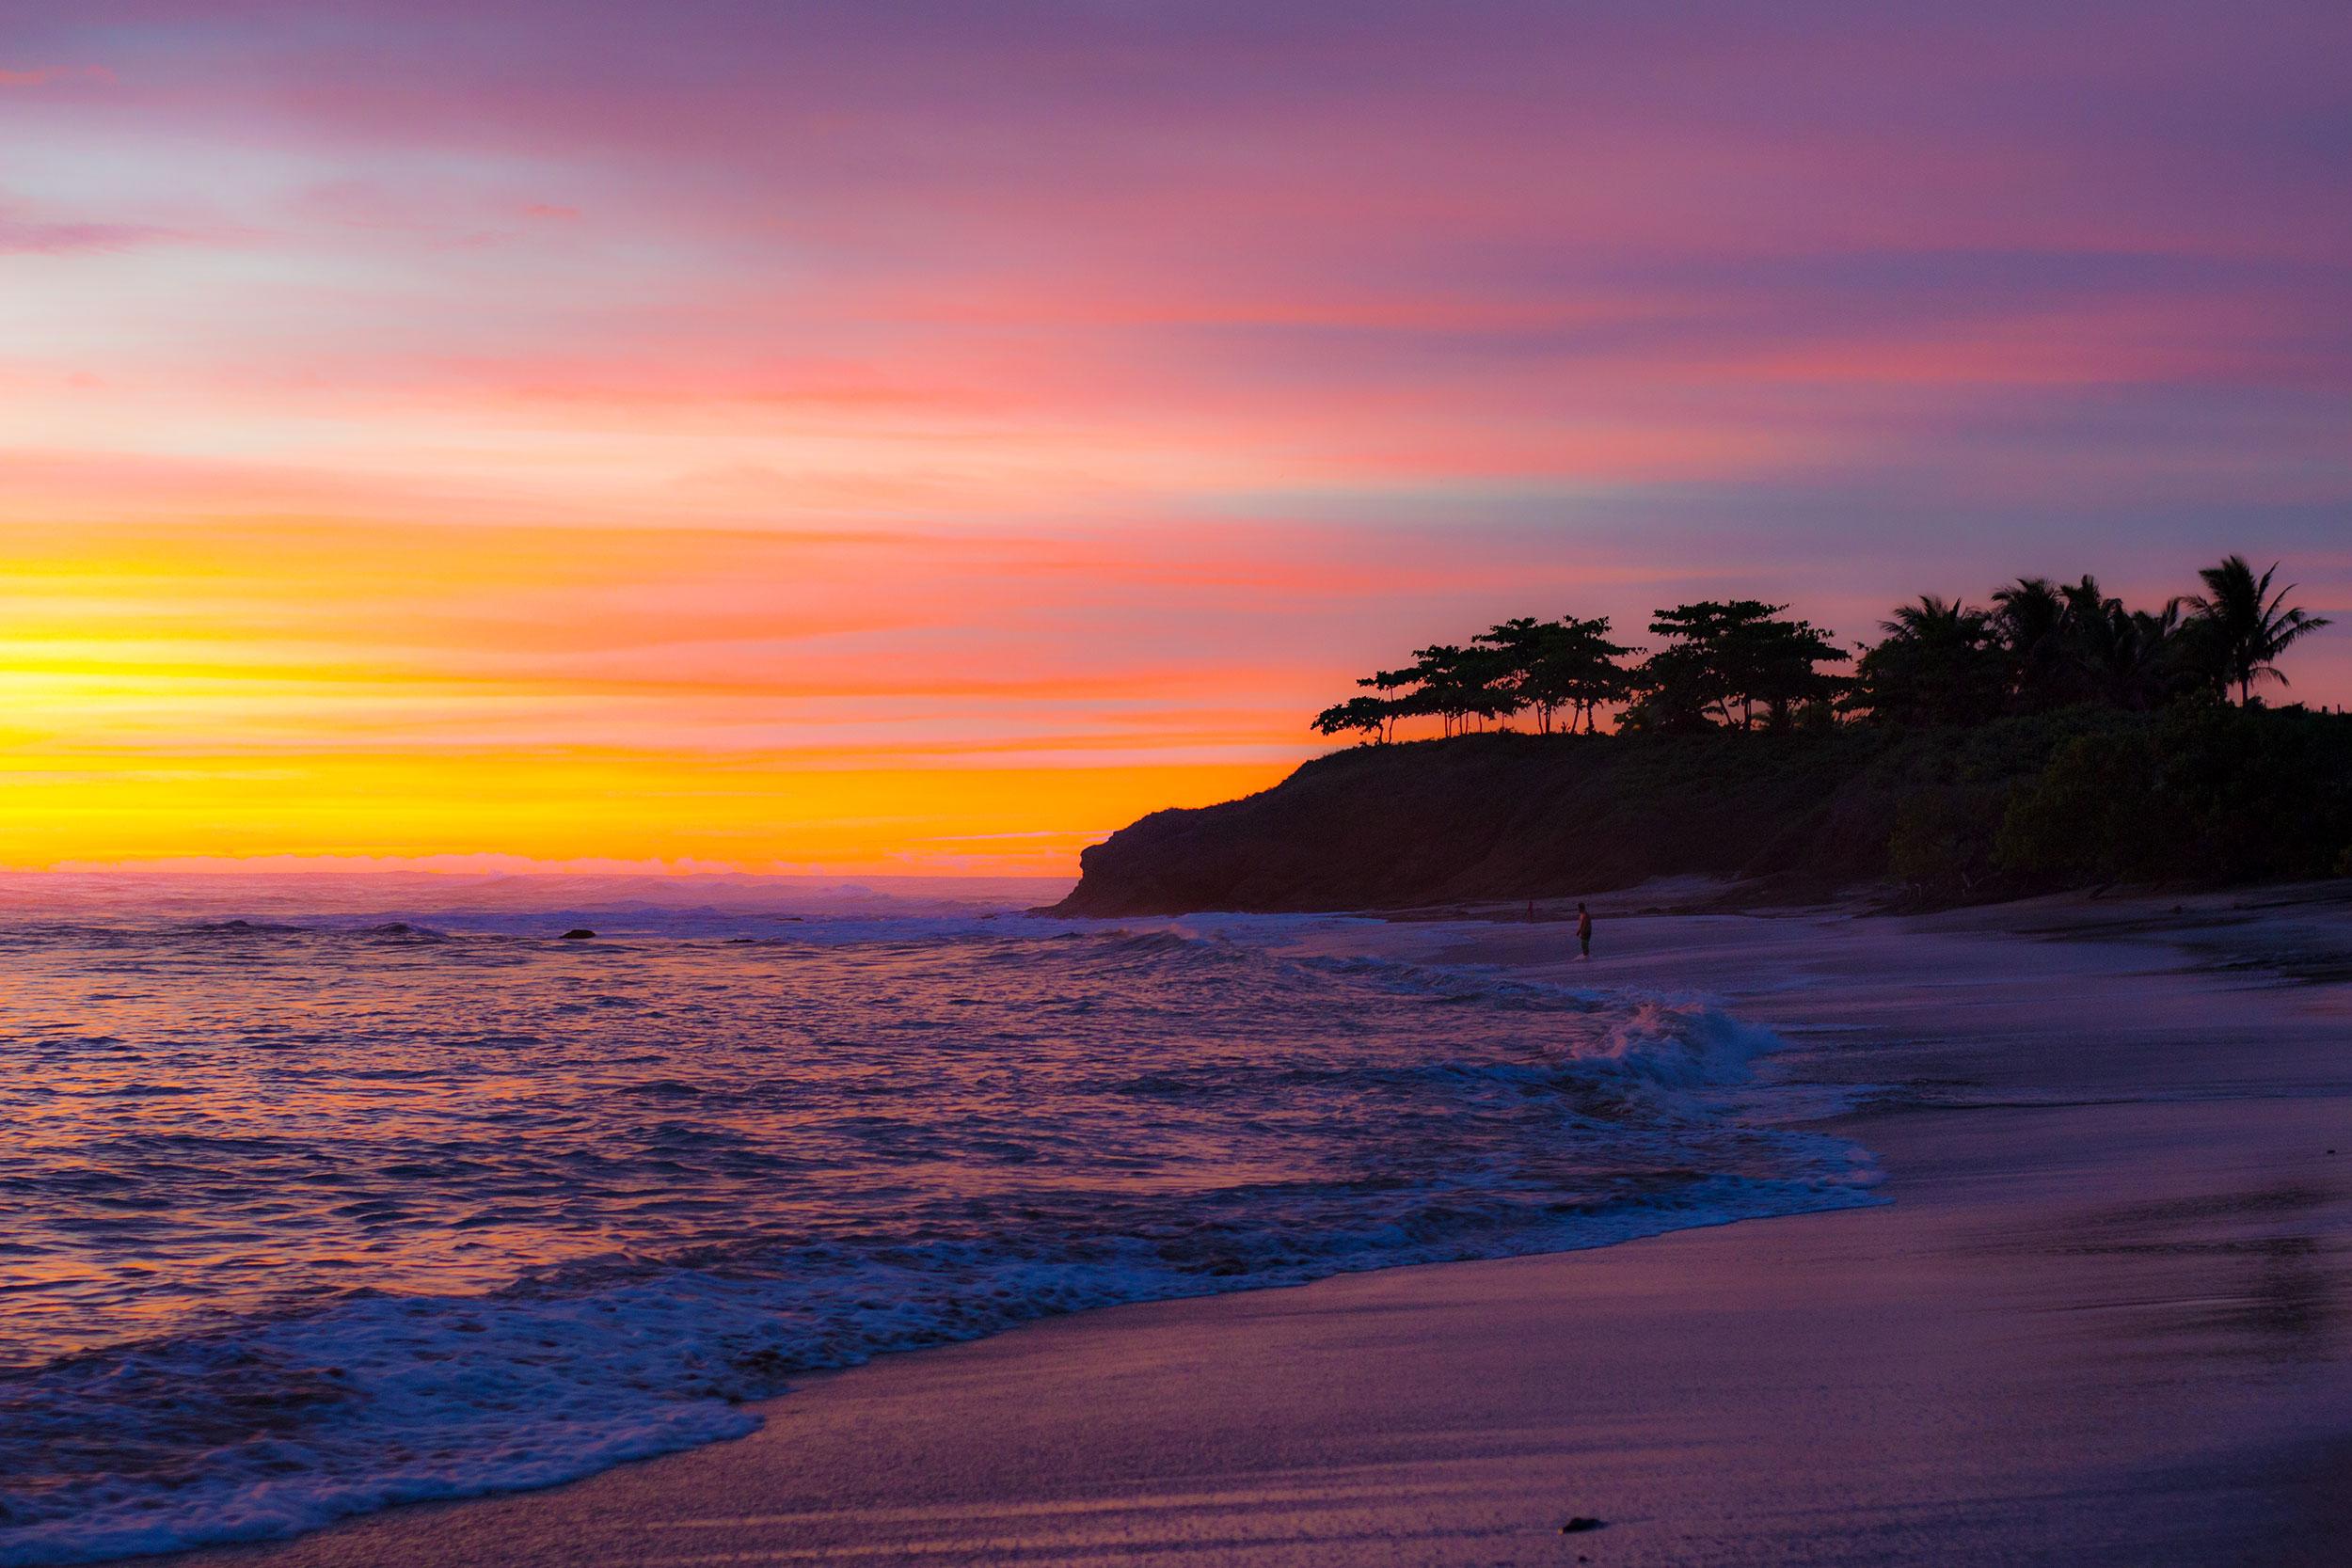 Playa-Avellana-Sunset3.jpg